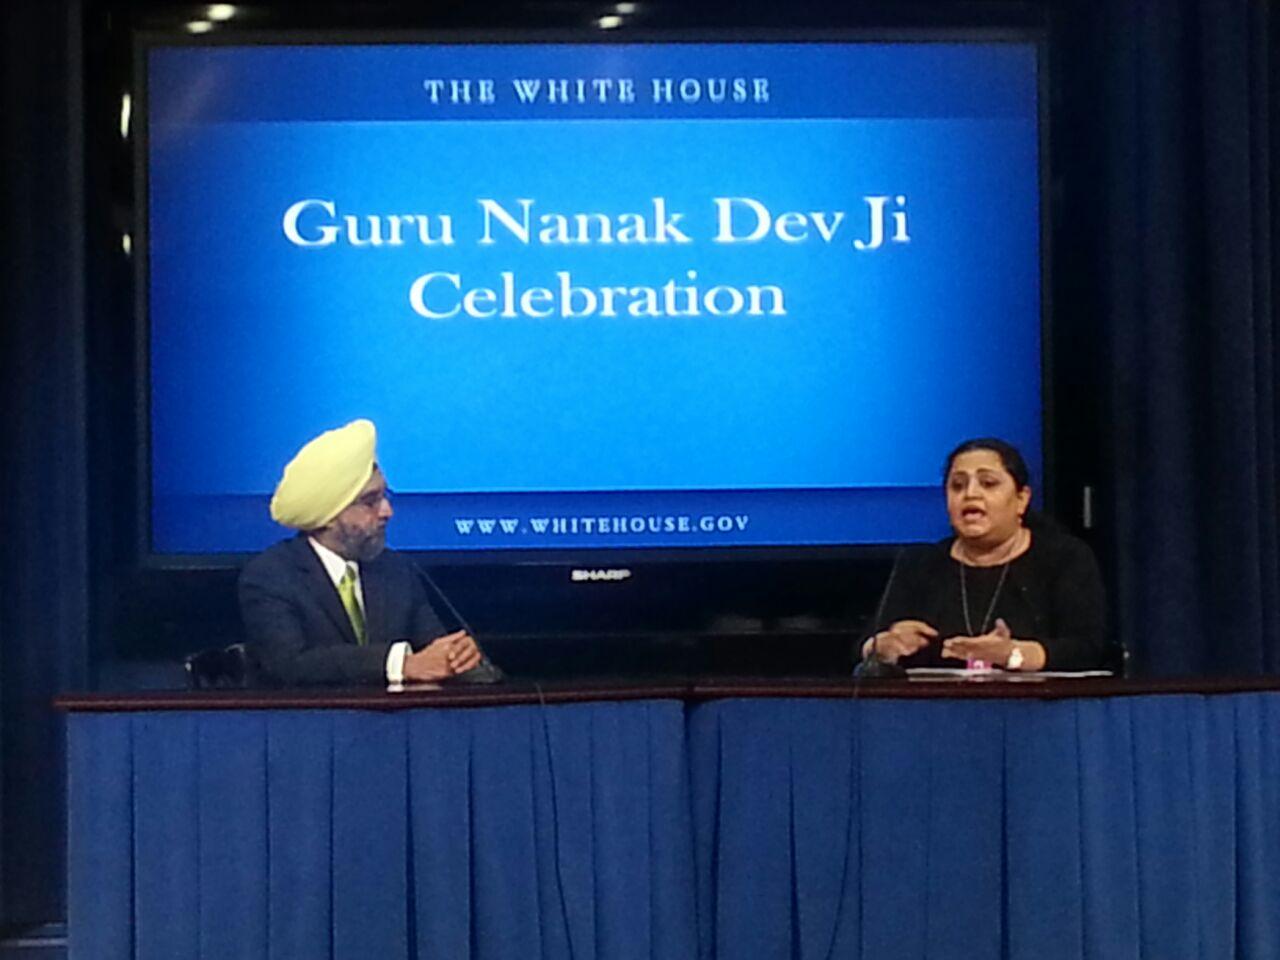 White house guru nanak dev ji pictures